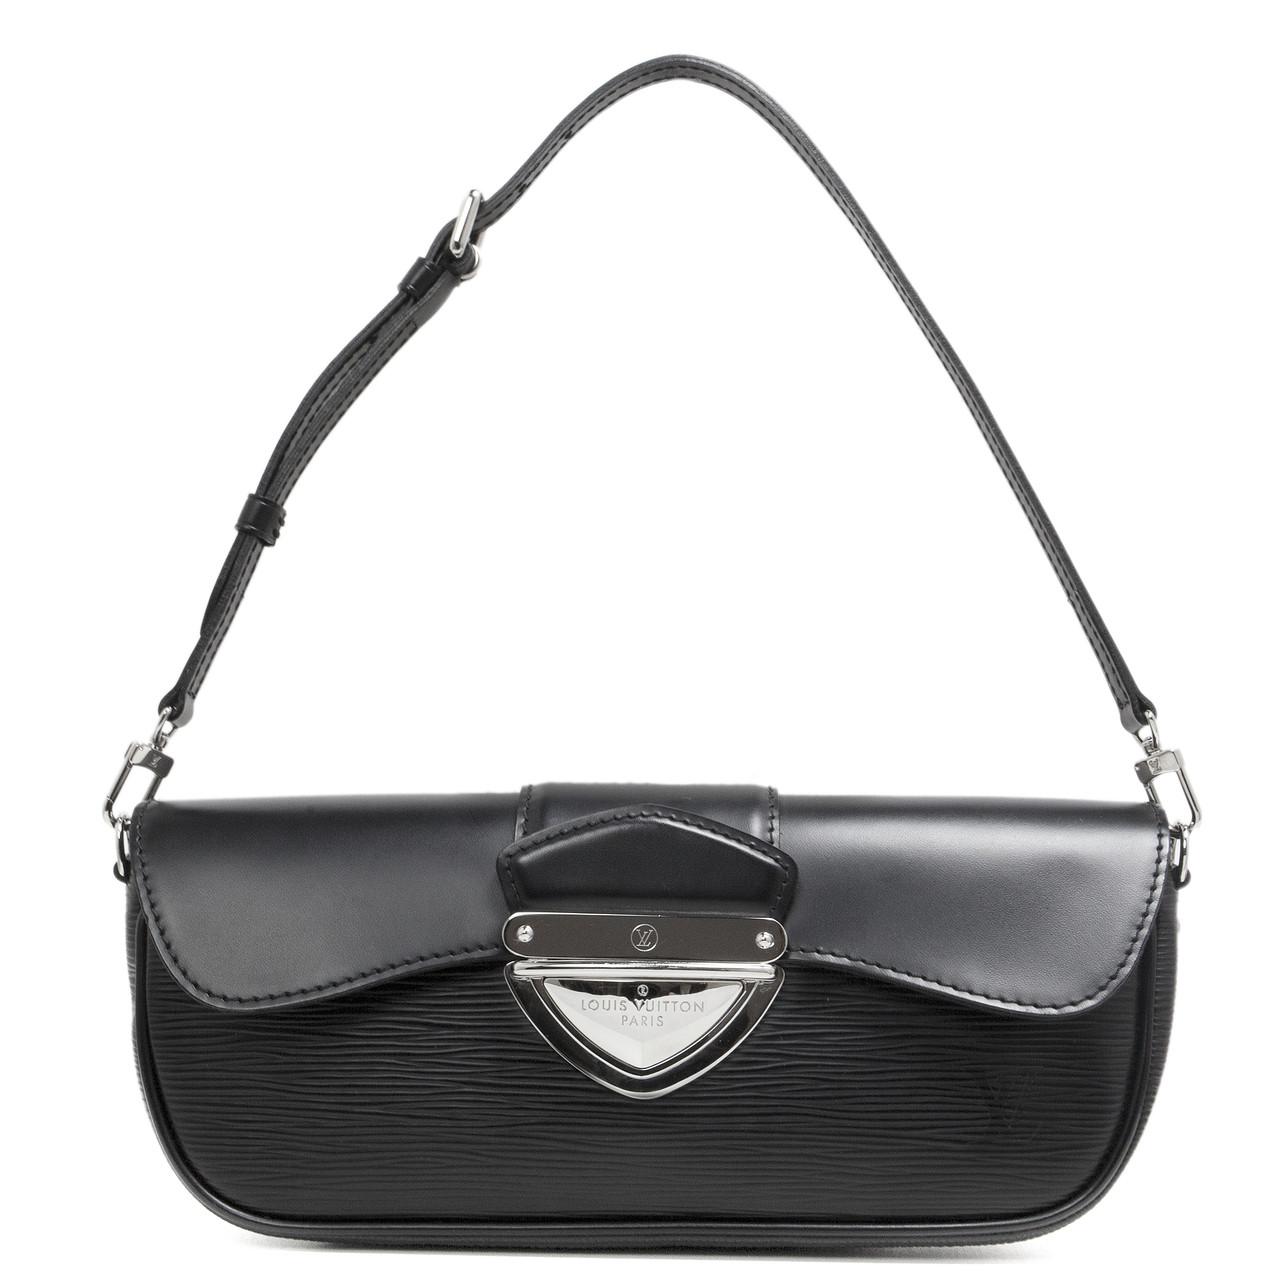 61bd4b986d81 Louis Vuitton Black Epi Montaigne Clutch - modaselle